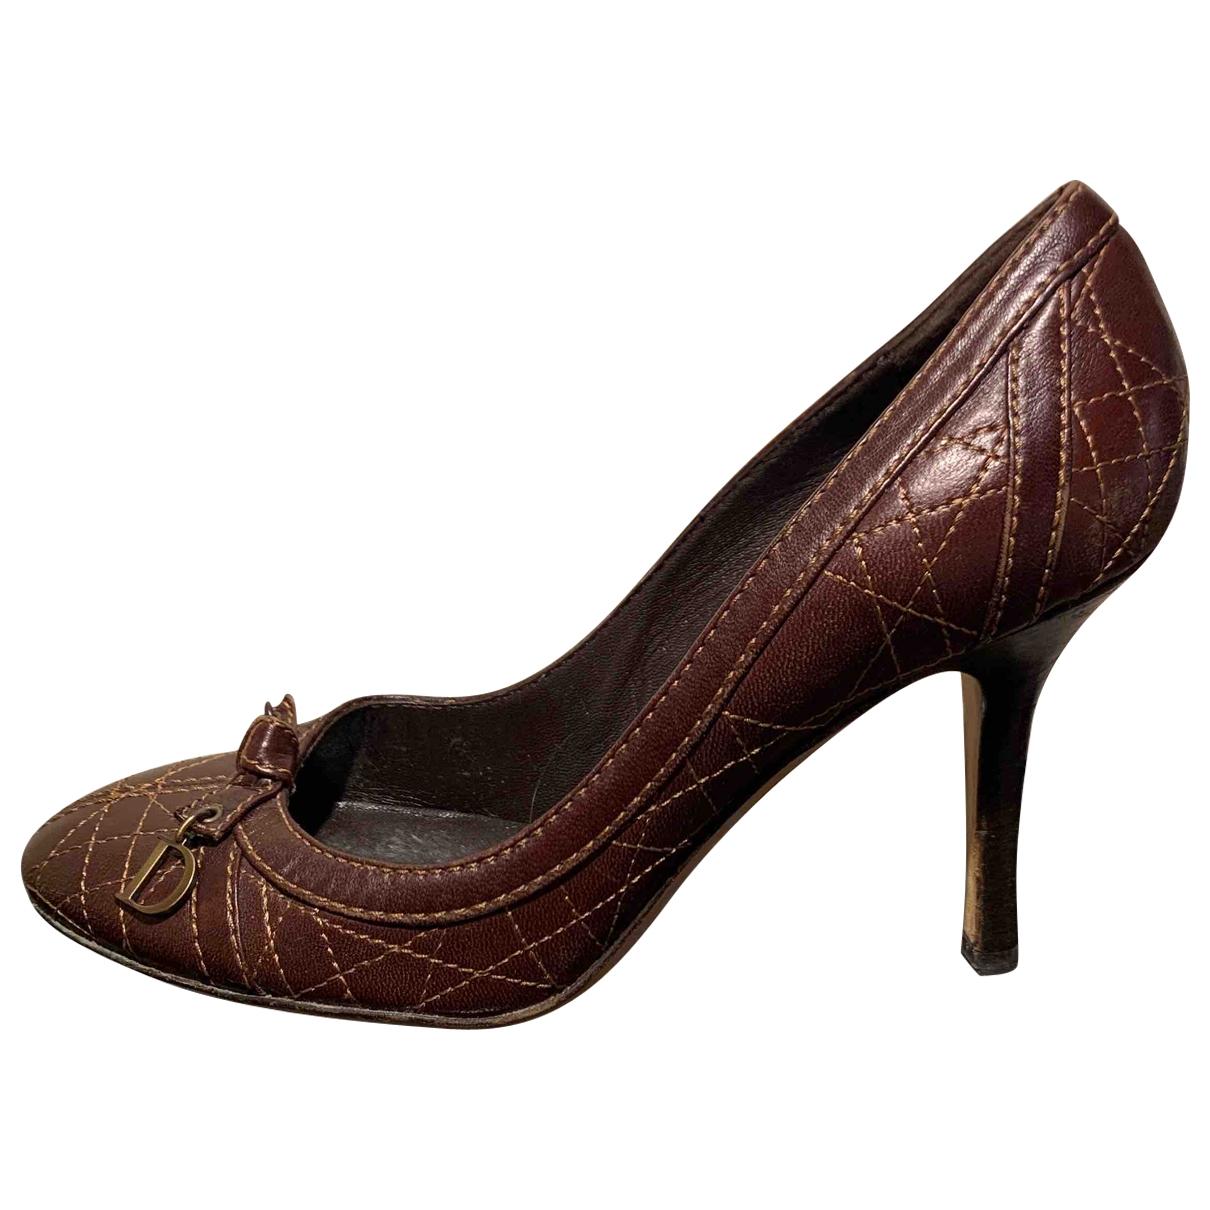 Dior - Escarpins   pour femme en cuir - marron